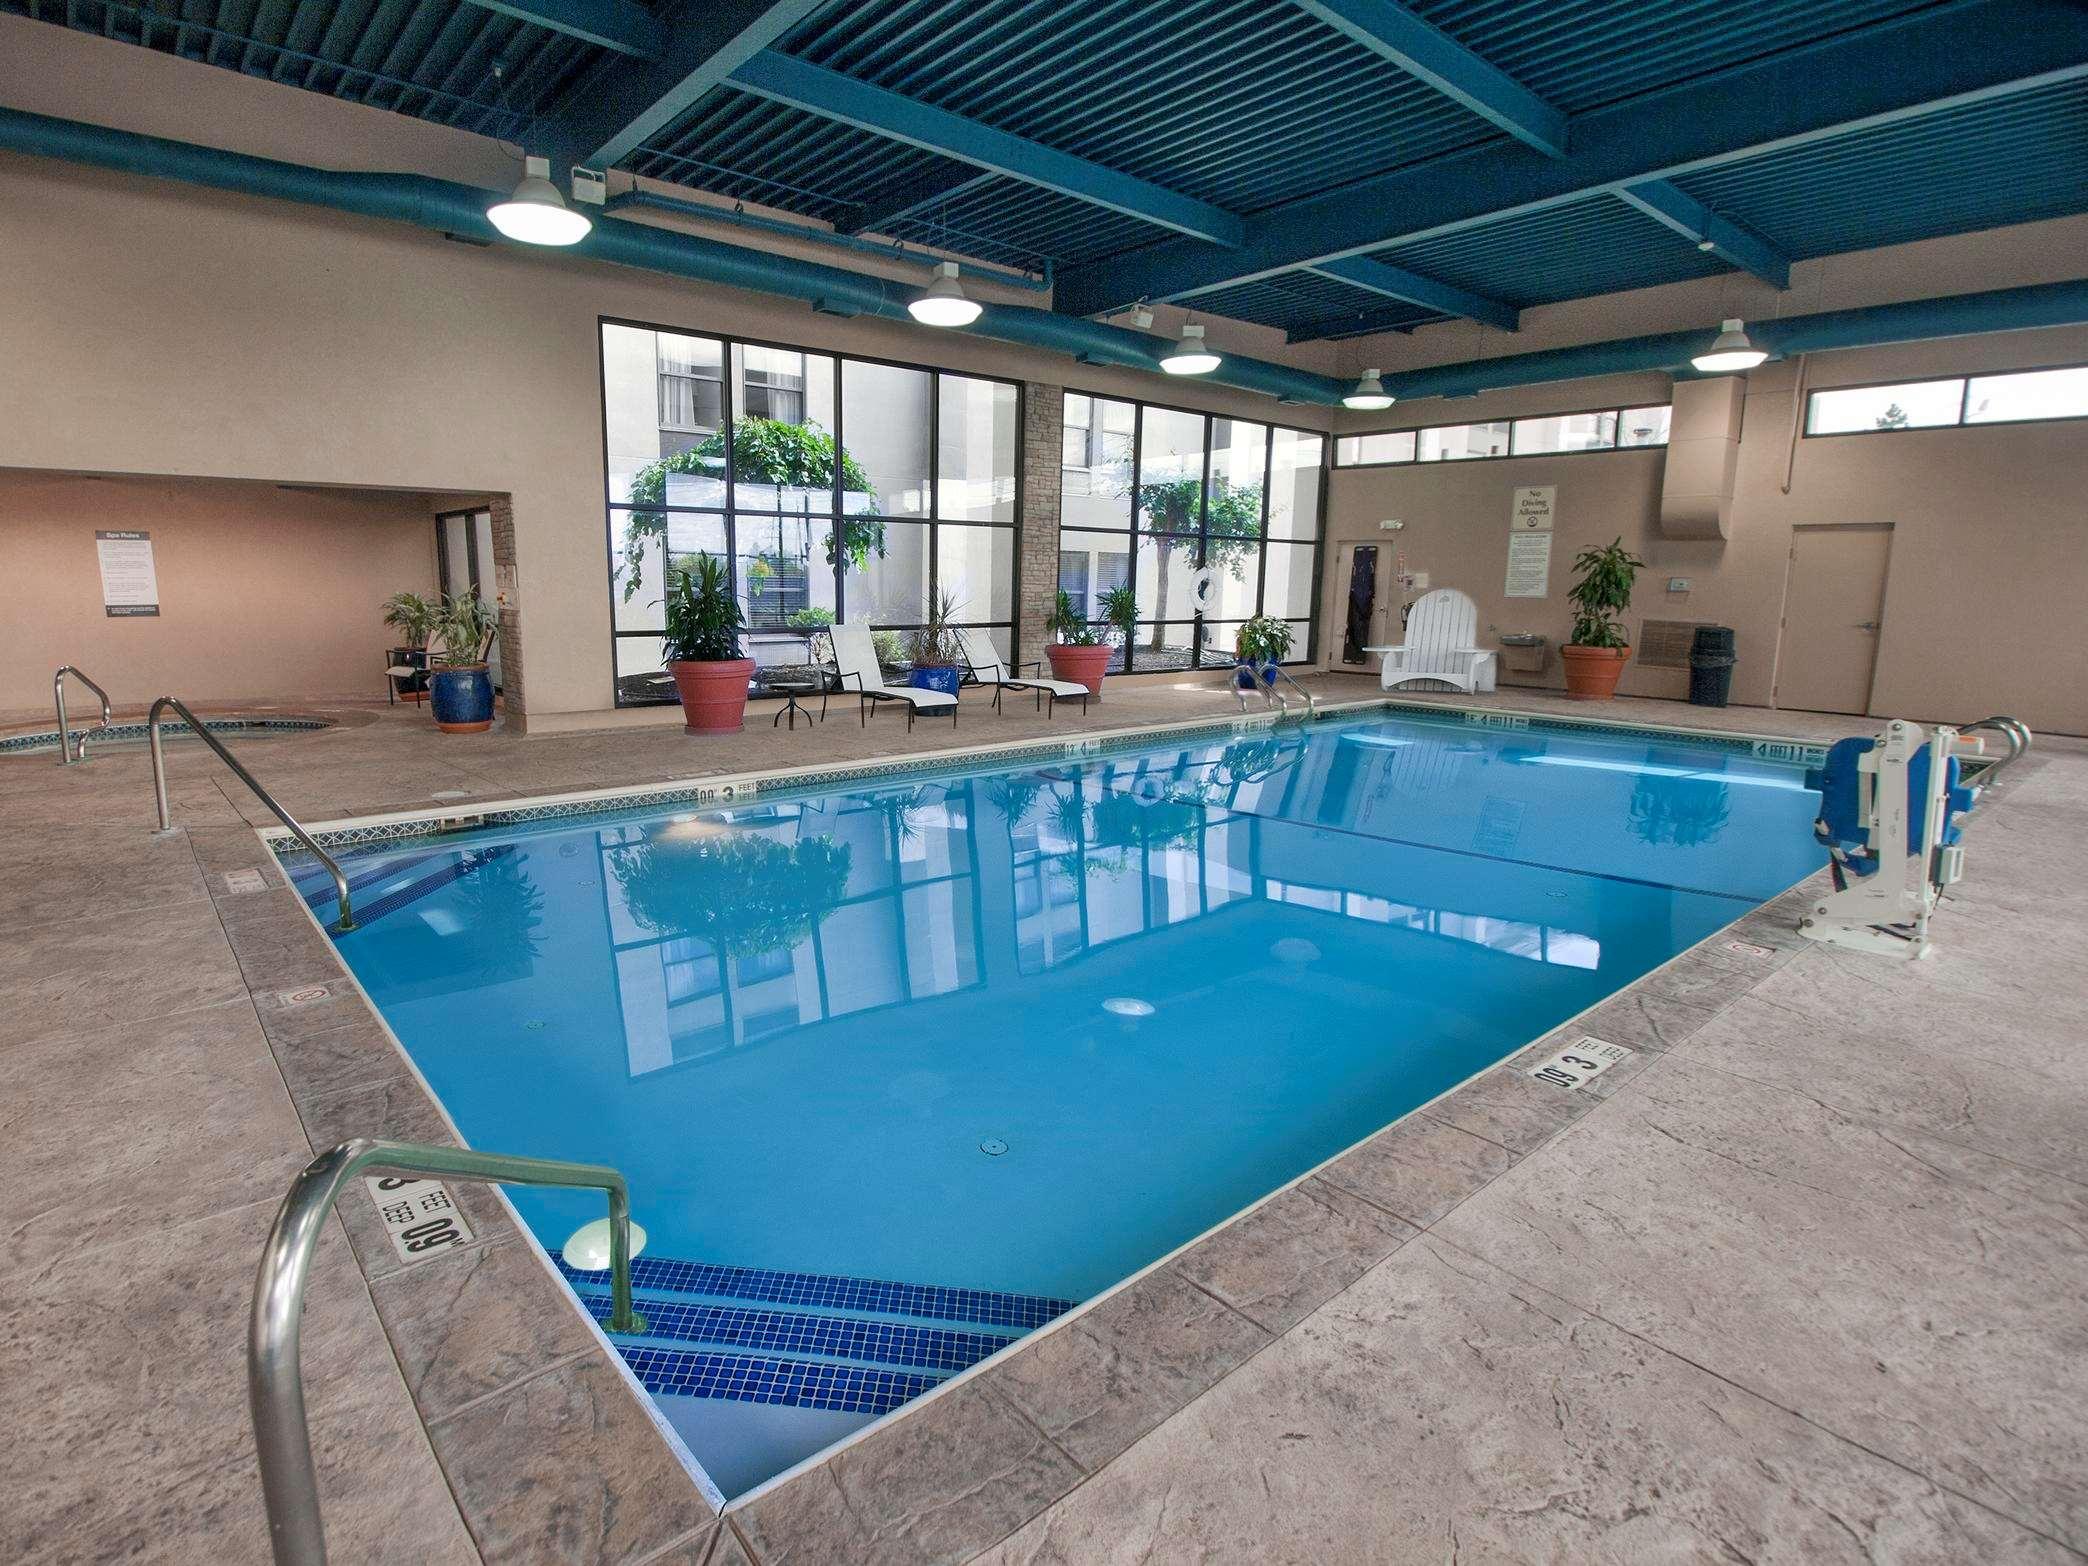 DoubleTree by Hilton Hotel Buffalo - Amherst image 14